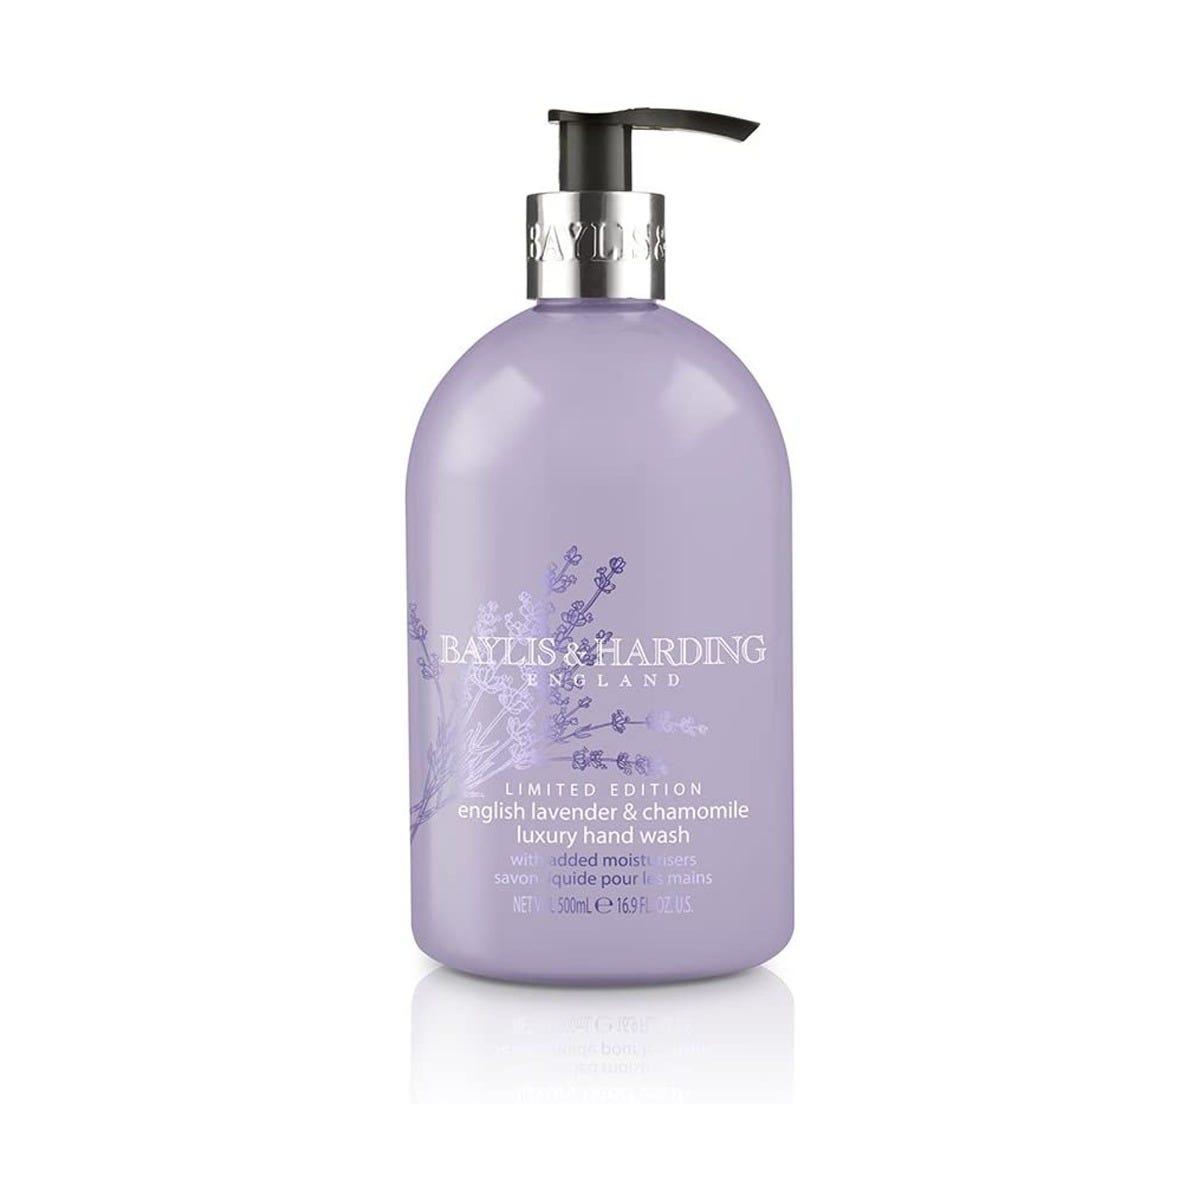 Jabón para manos Baylis & Harding® aroma lavanda